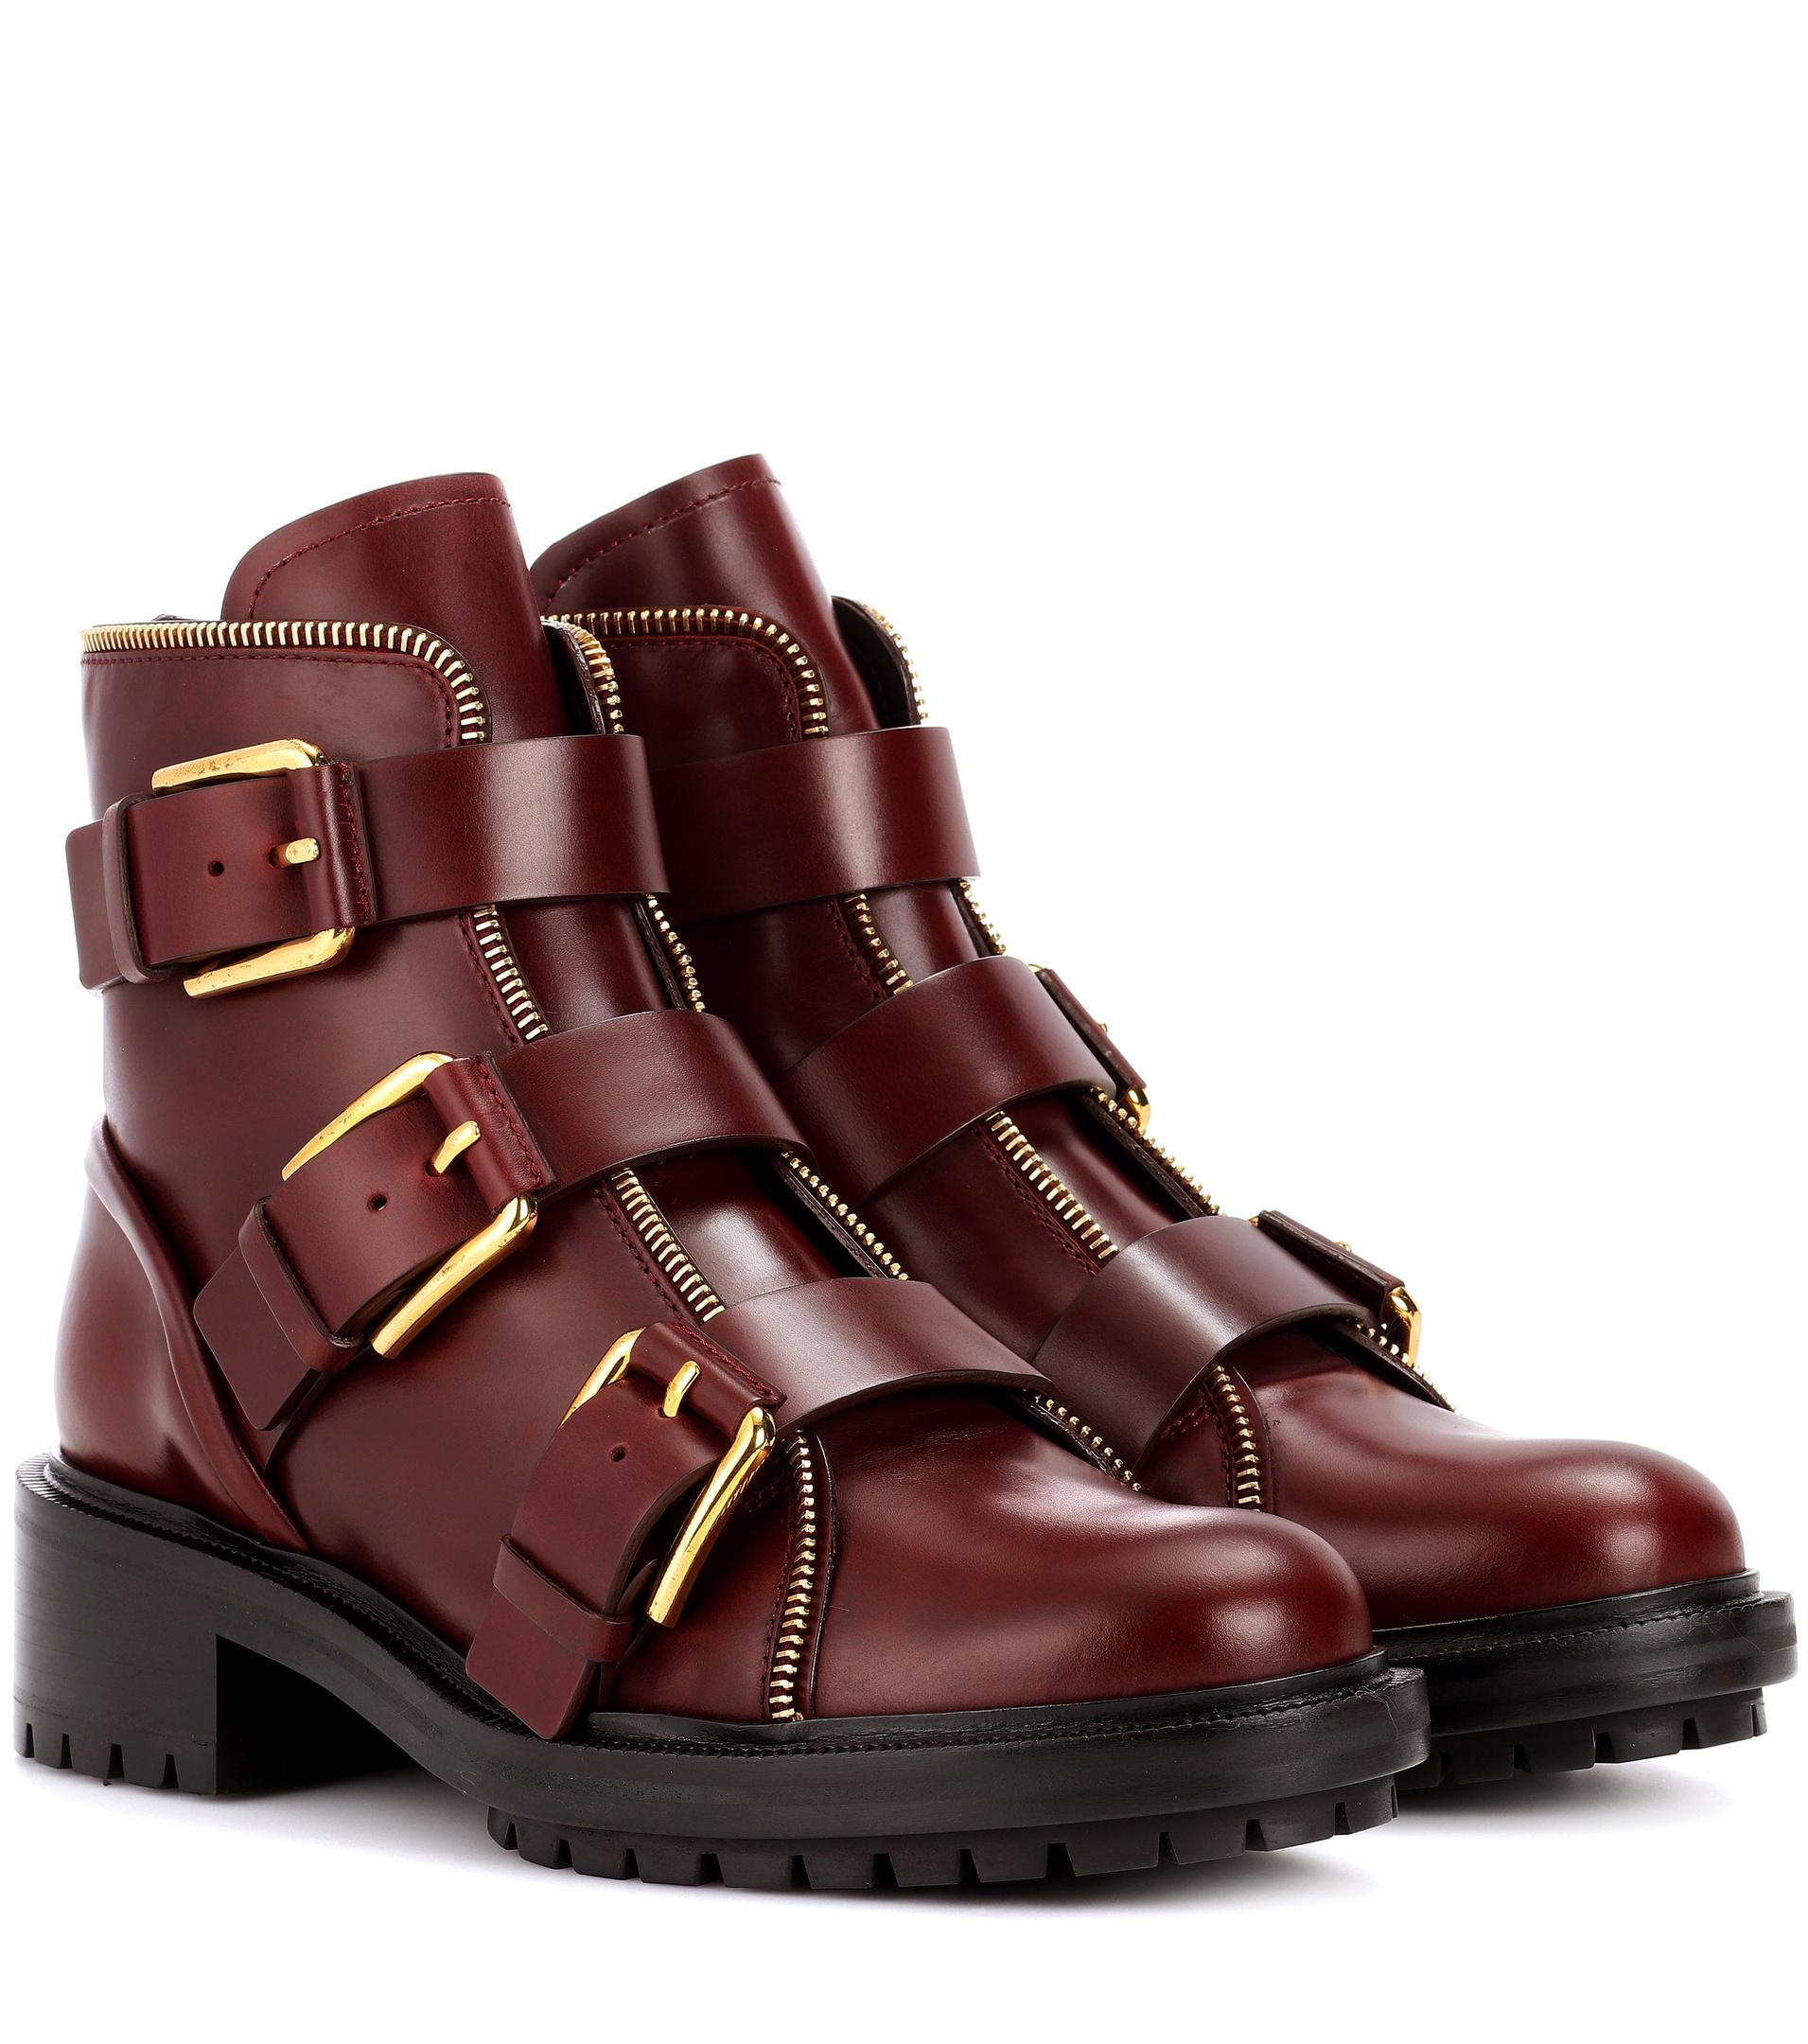 Balmain Ambra Ranger Boots bH4Oinpno